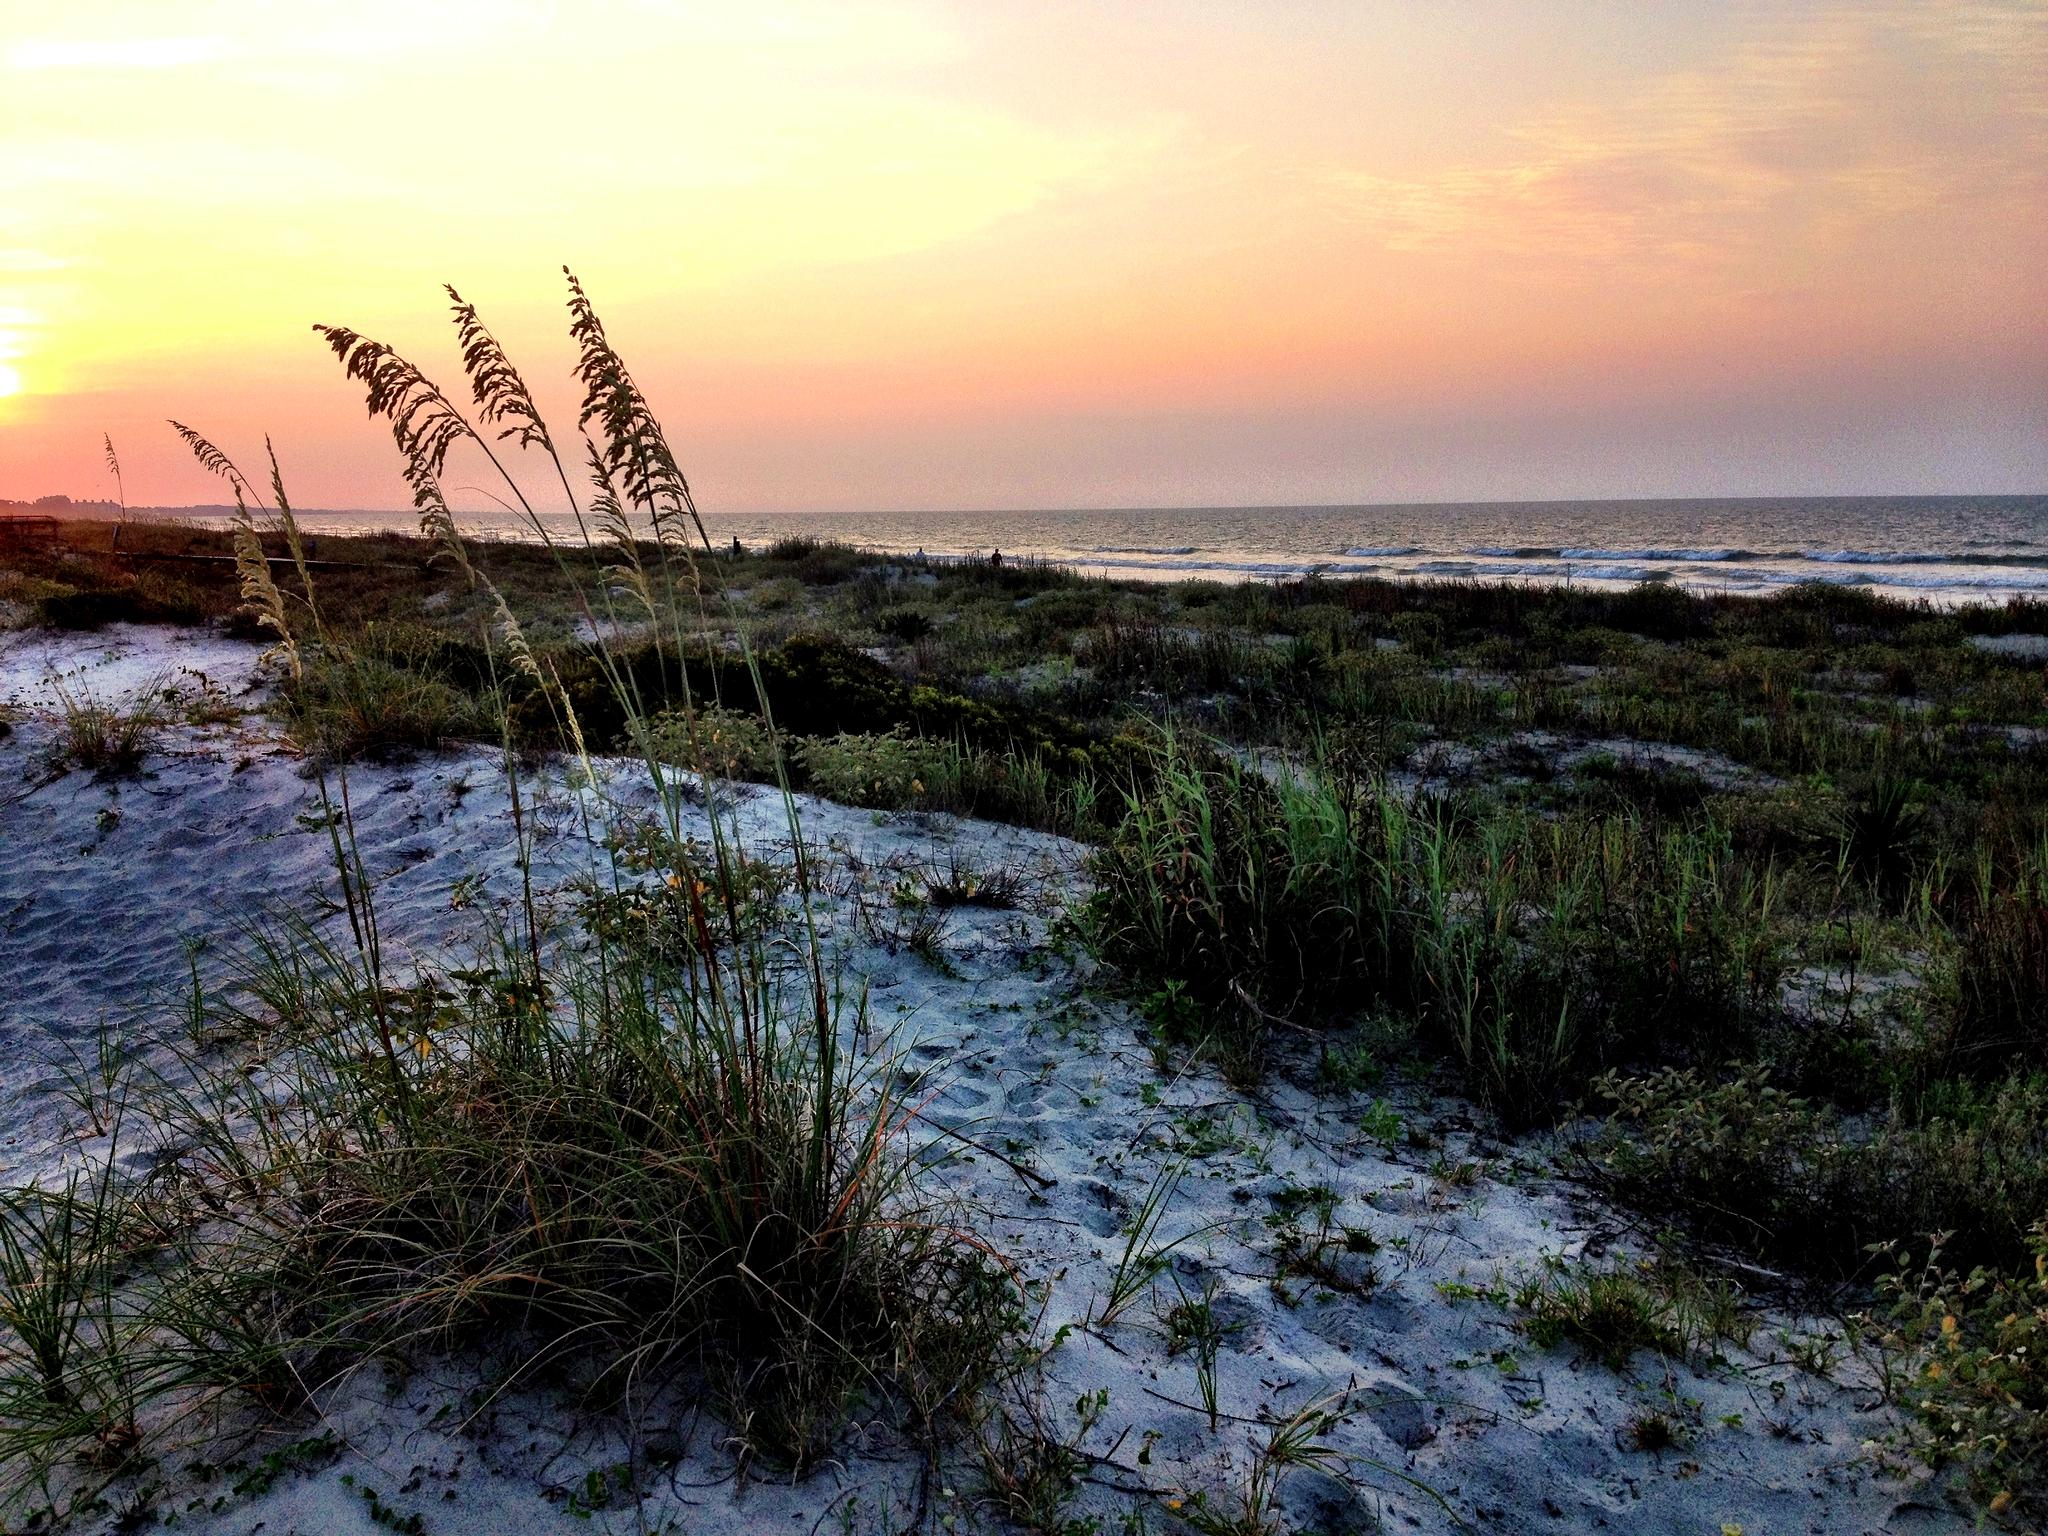 Kiawah Island beach at sunset